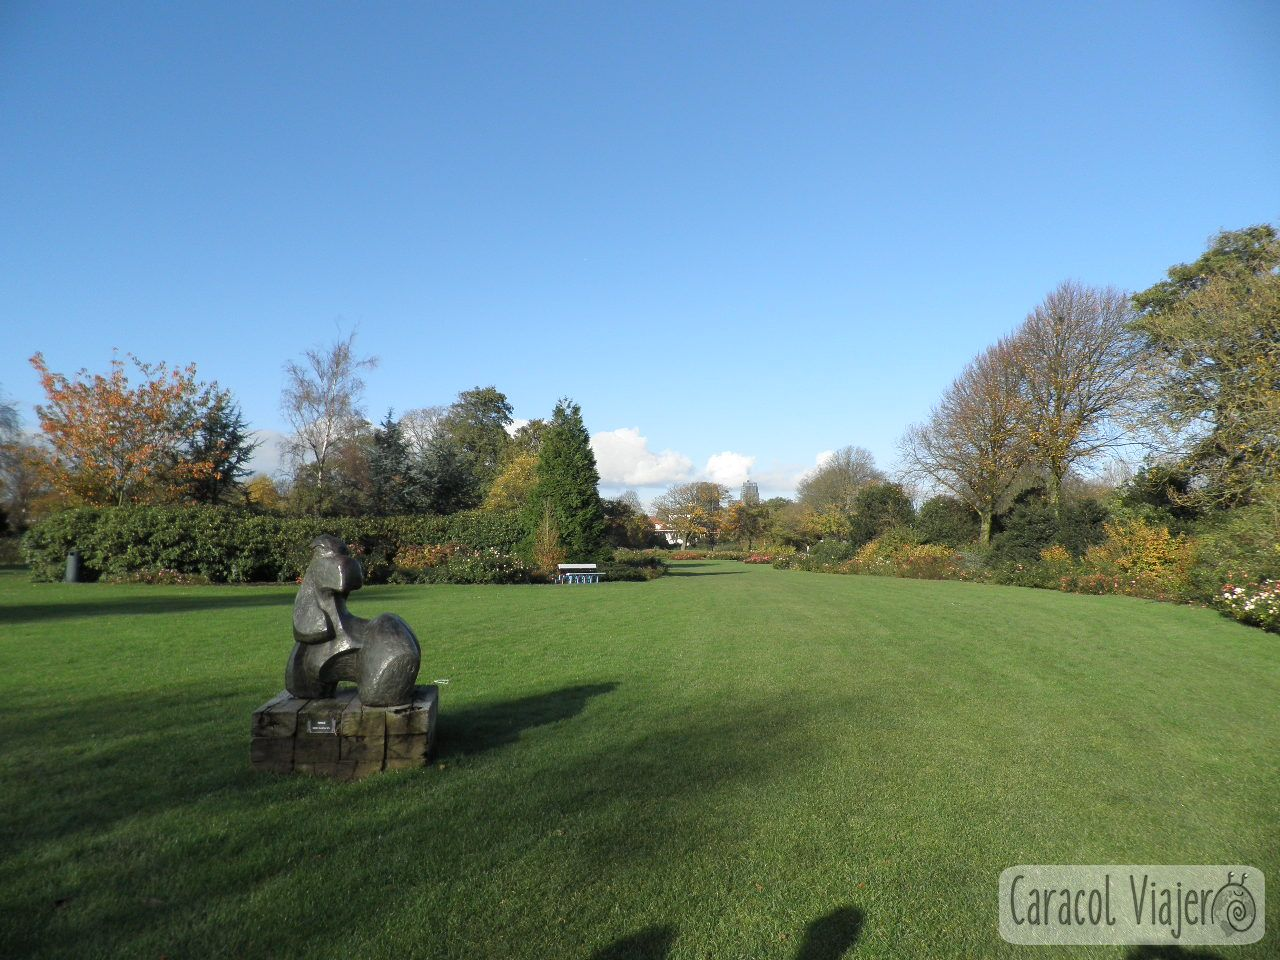 Parque La Haya Westbroekpark